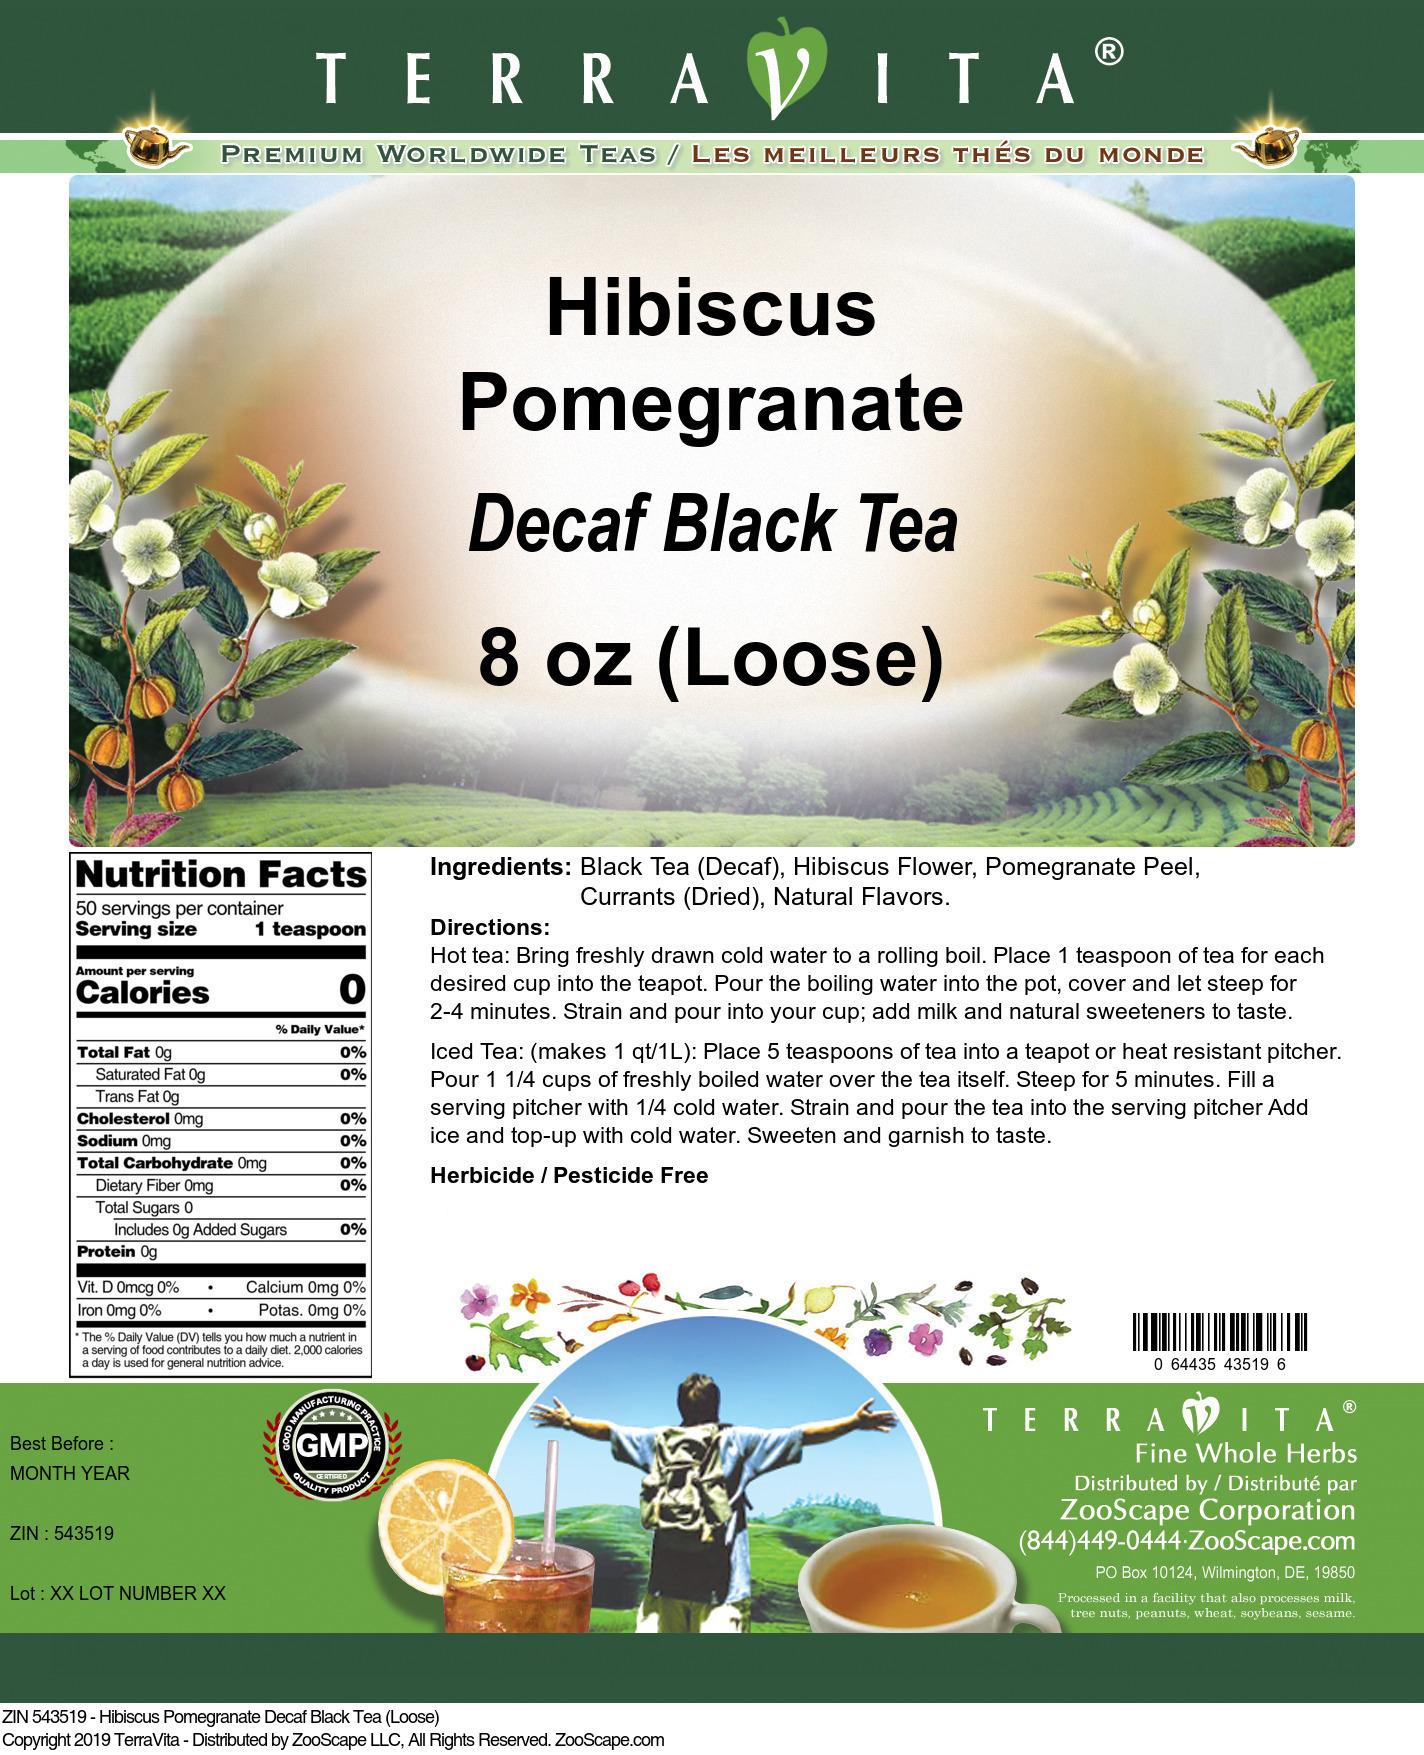 Hibiscus Pomegranate Decaf Black Tea (Loose)